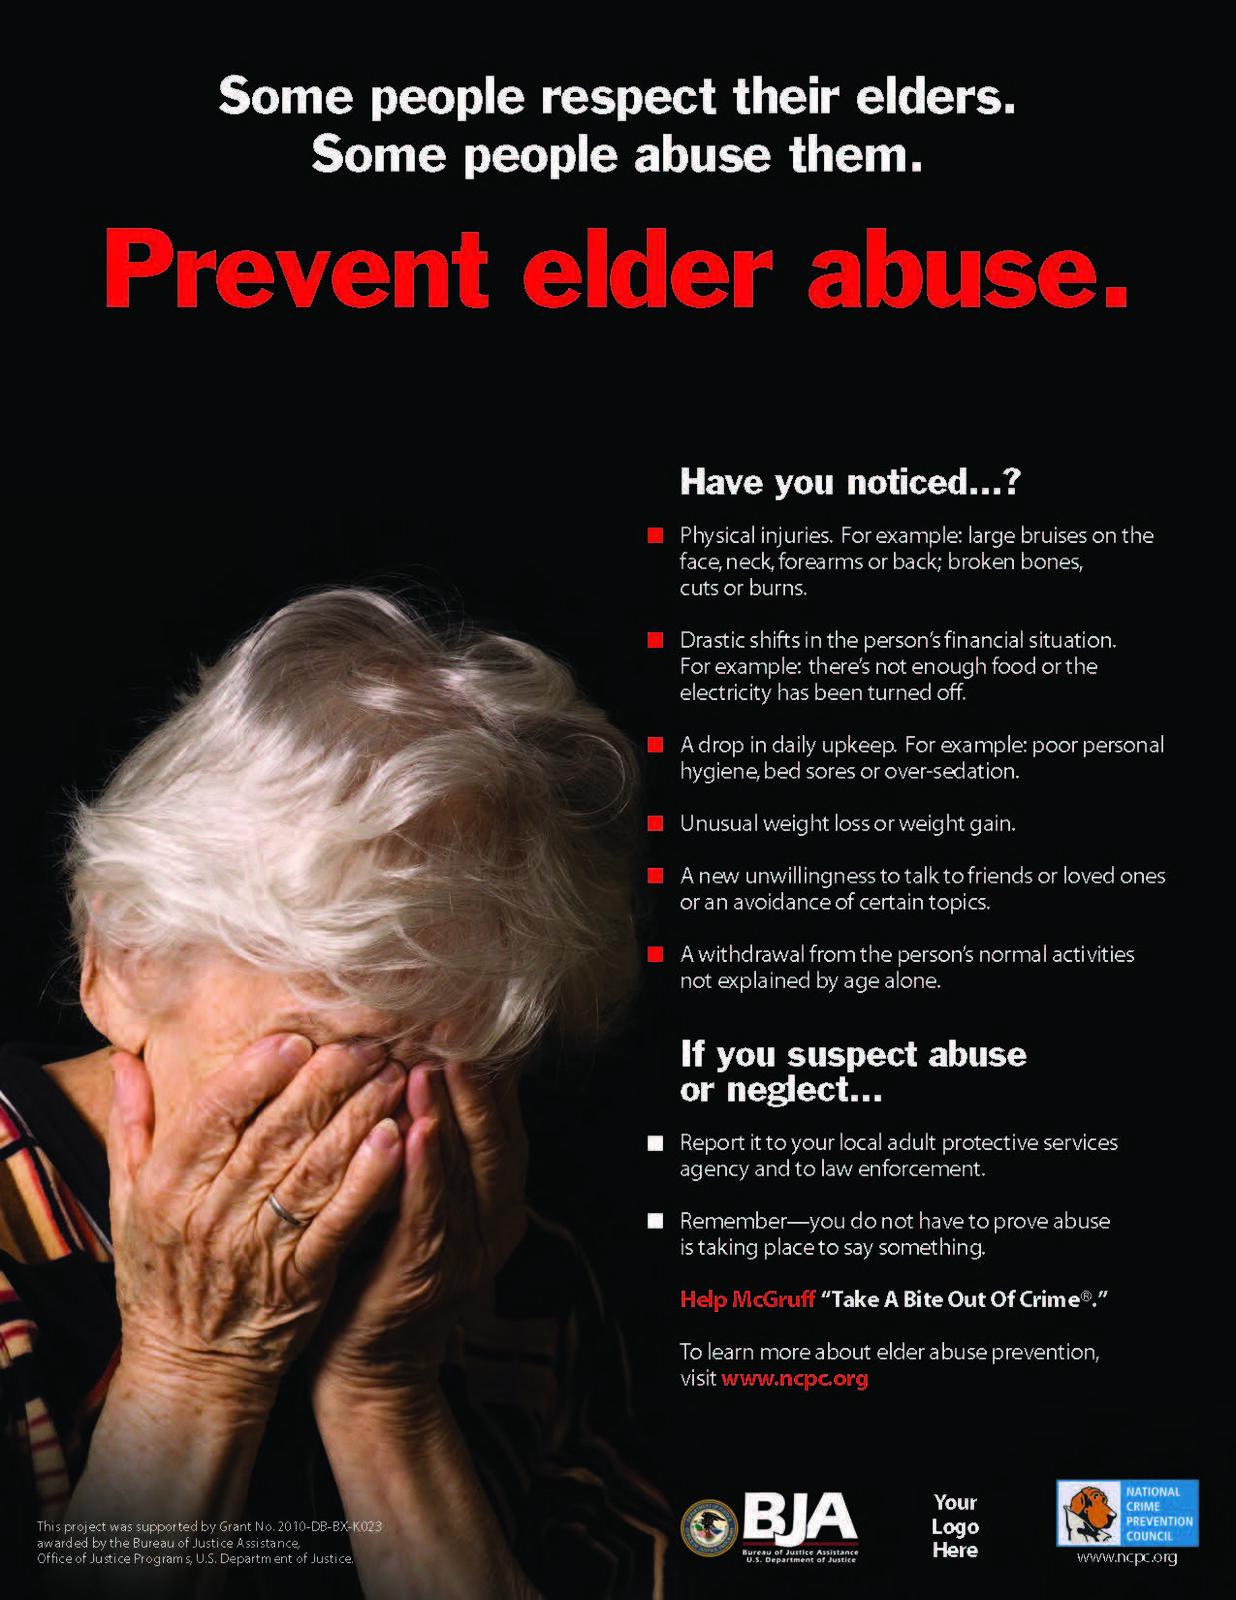 Preventing Elder Abuse (Benton County Sheriff's Office